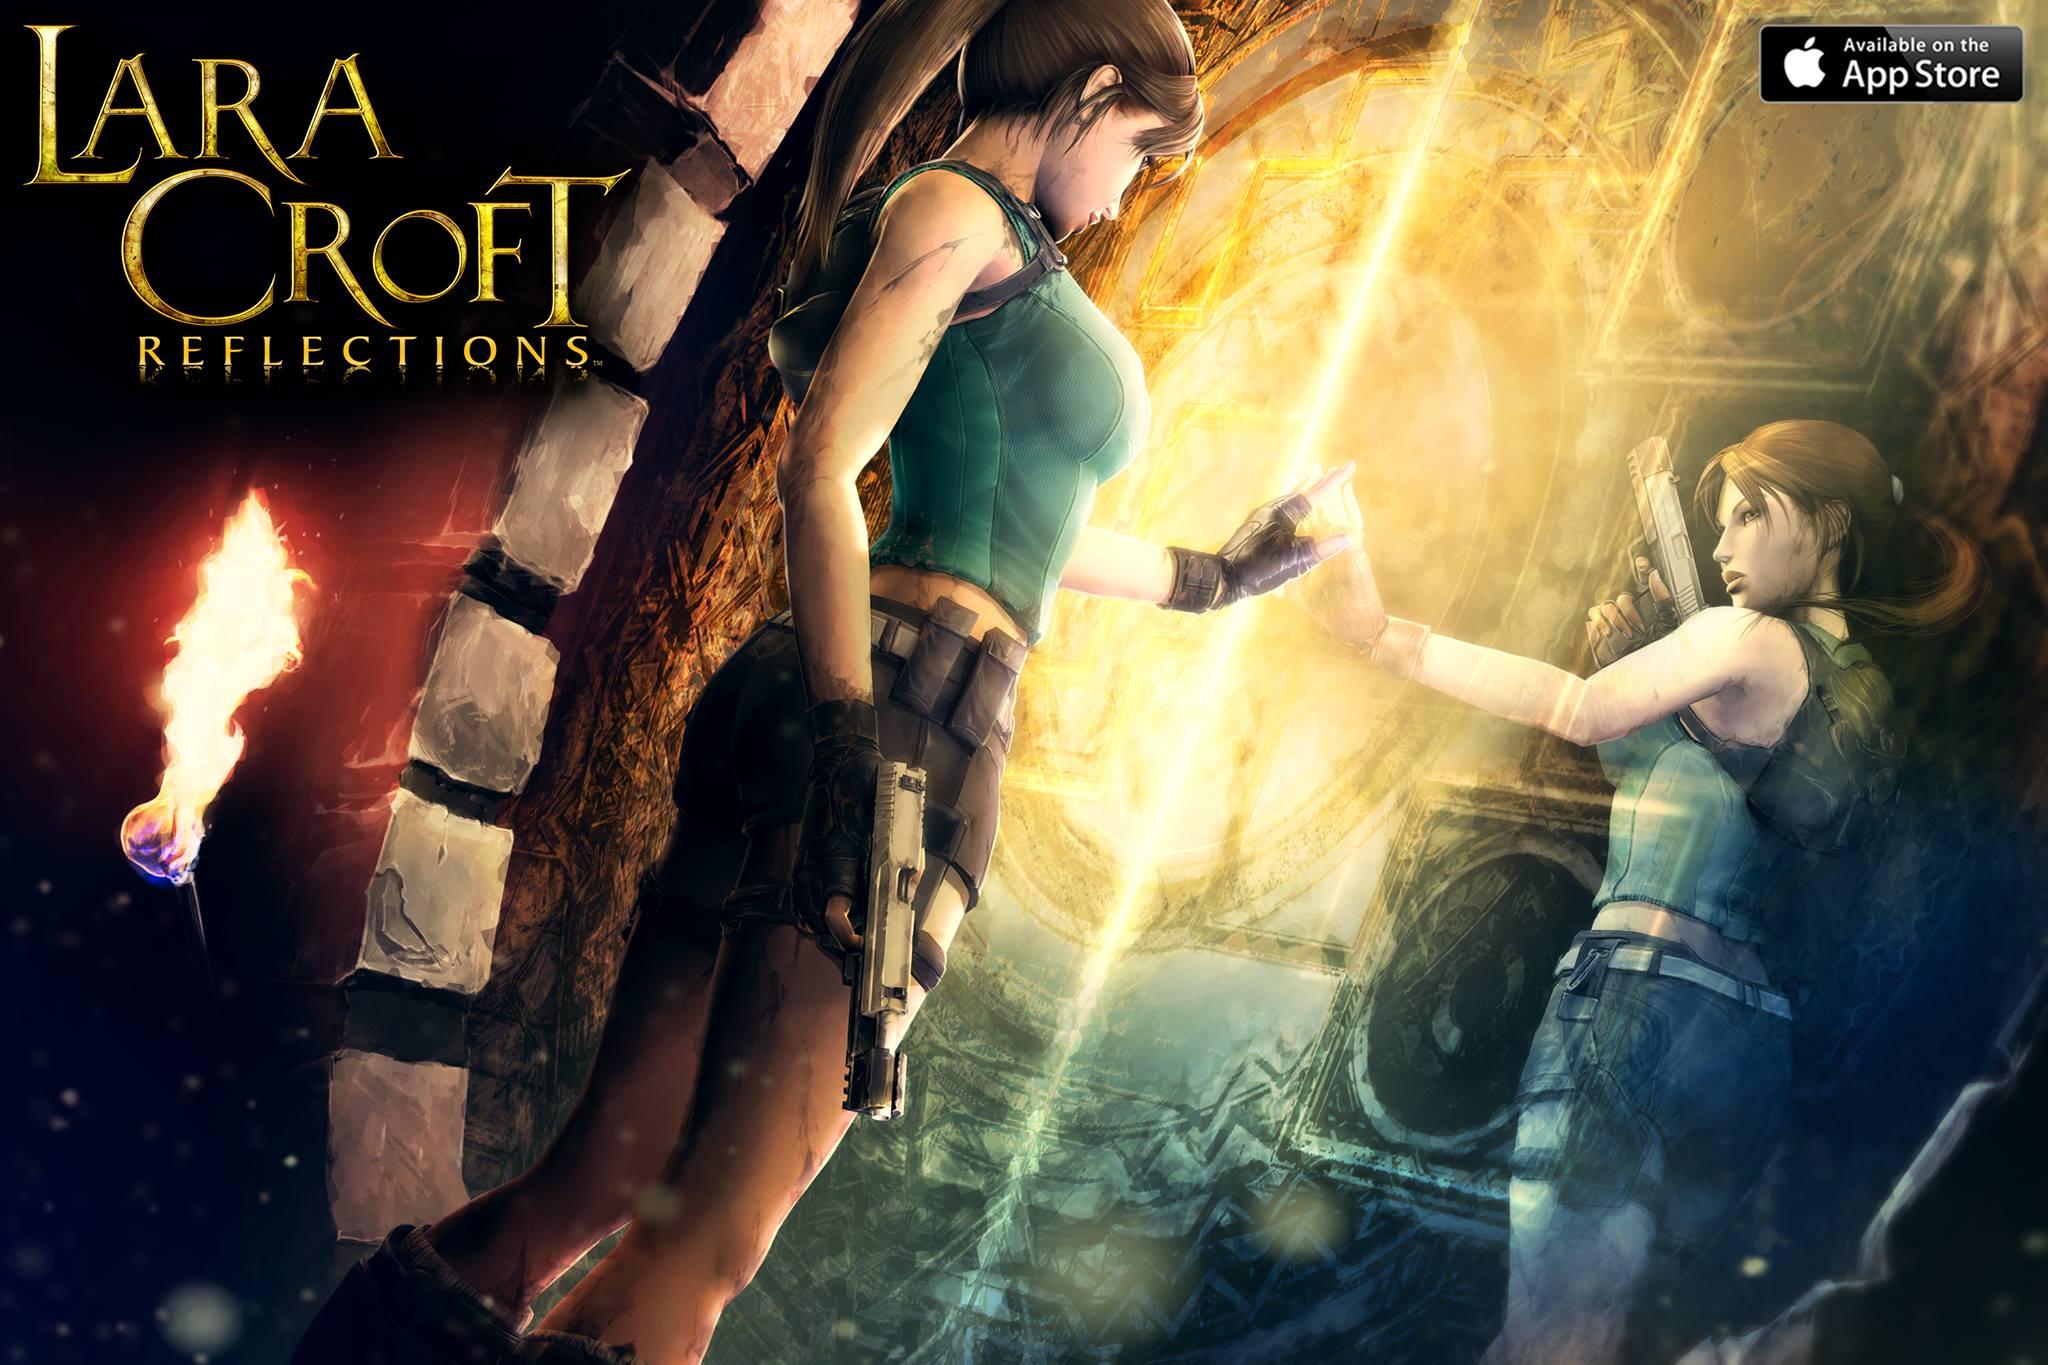 lara-croft-reflections